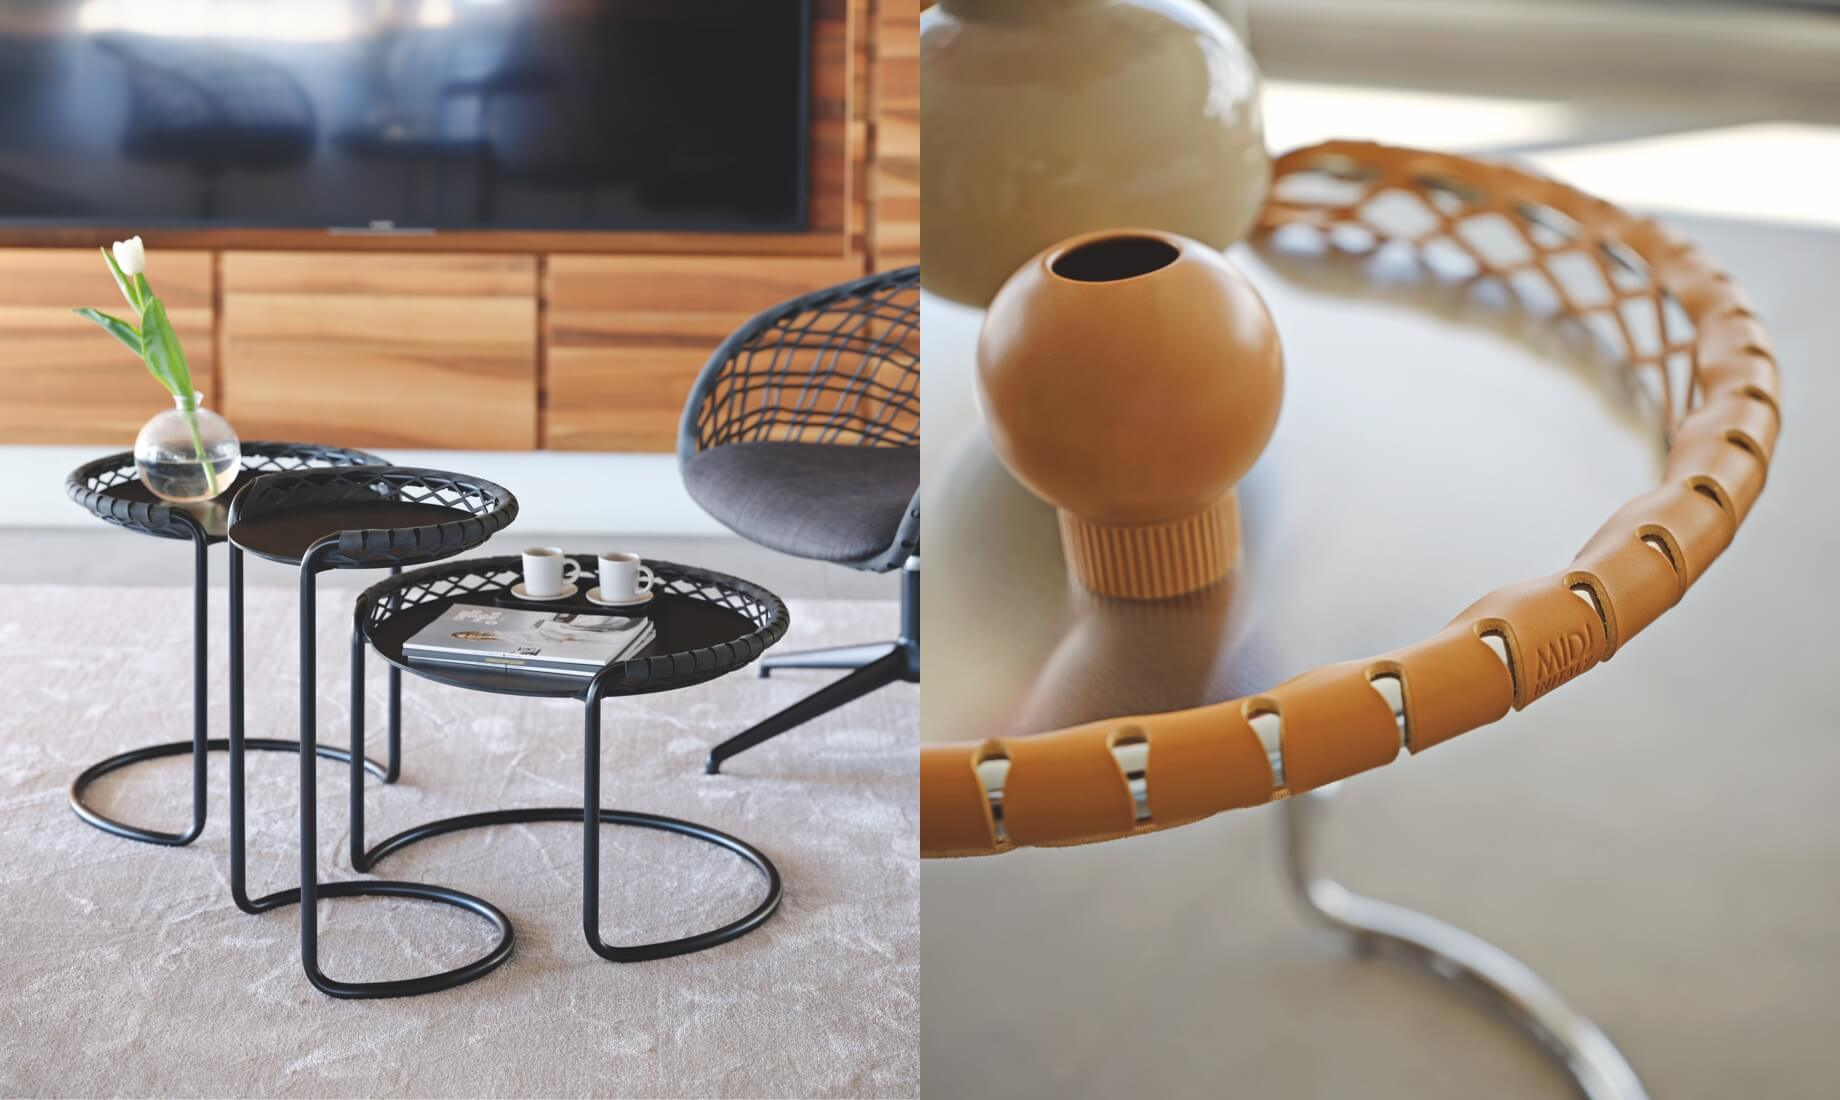 Coffee table P47, design Franco Poli.